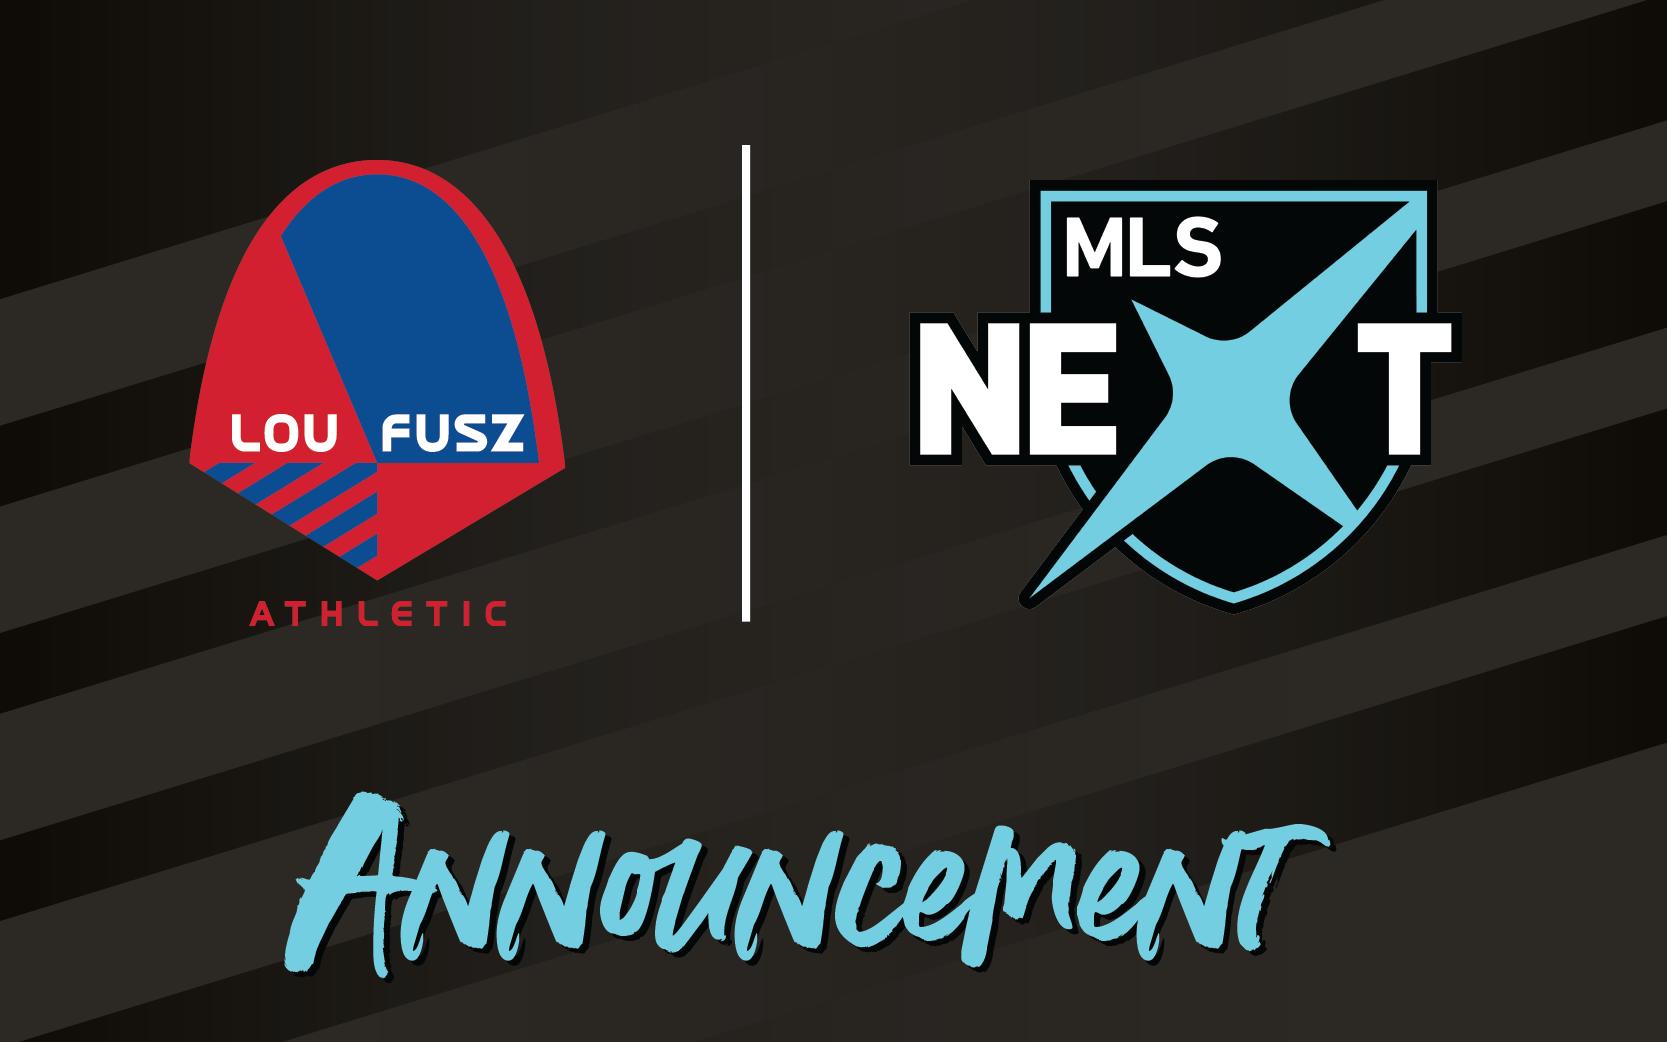 MLS Next Announcement